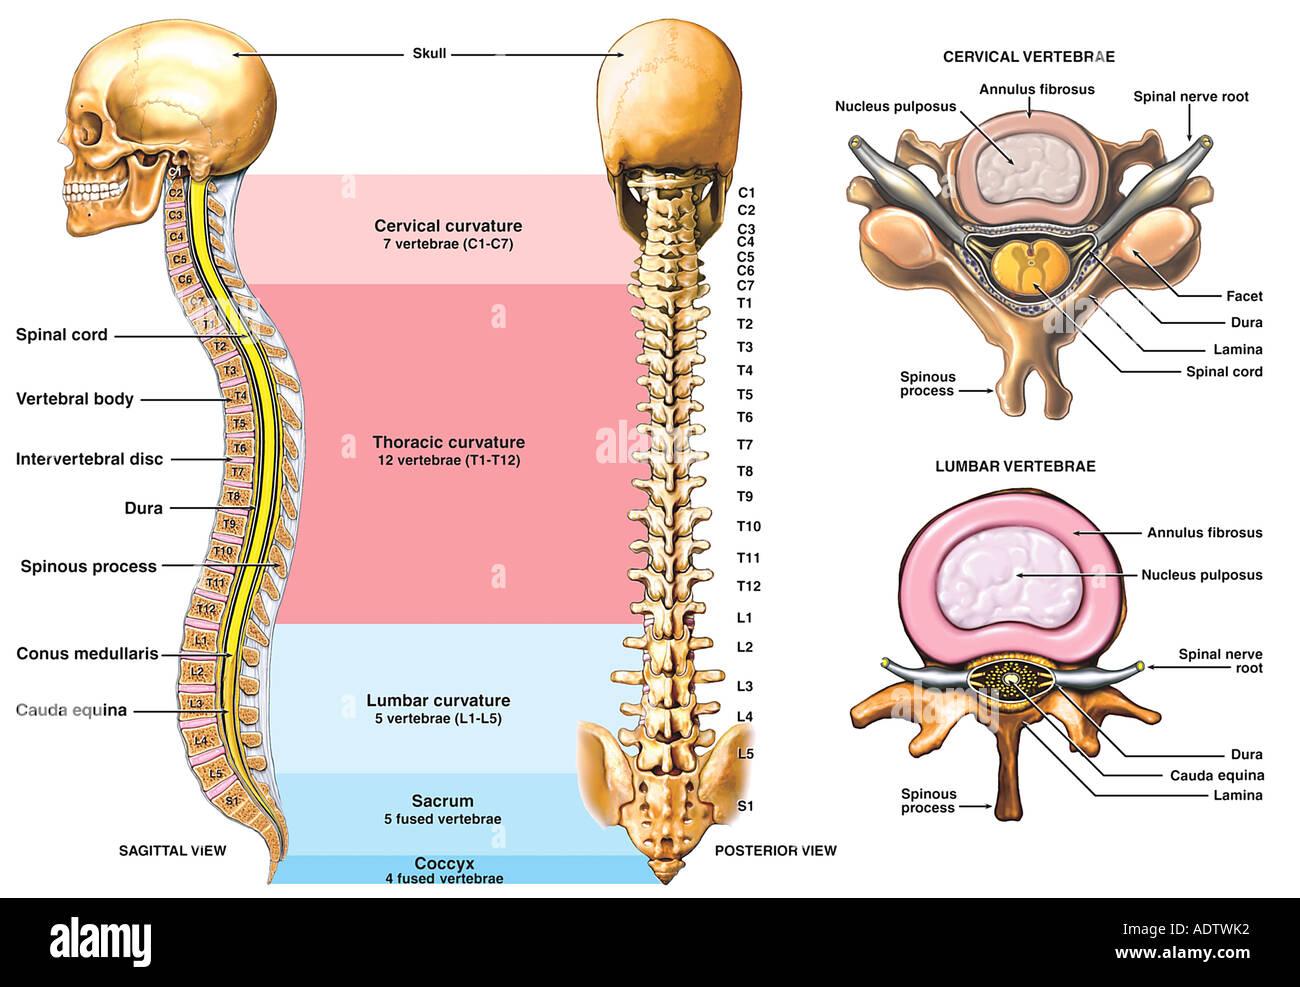 Cervical Spines Imágenes De Stock & Cervical Spines Fotos De Stock ...